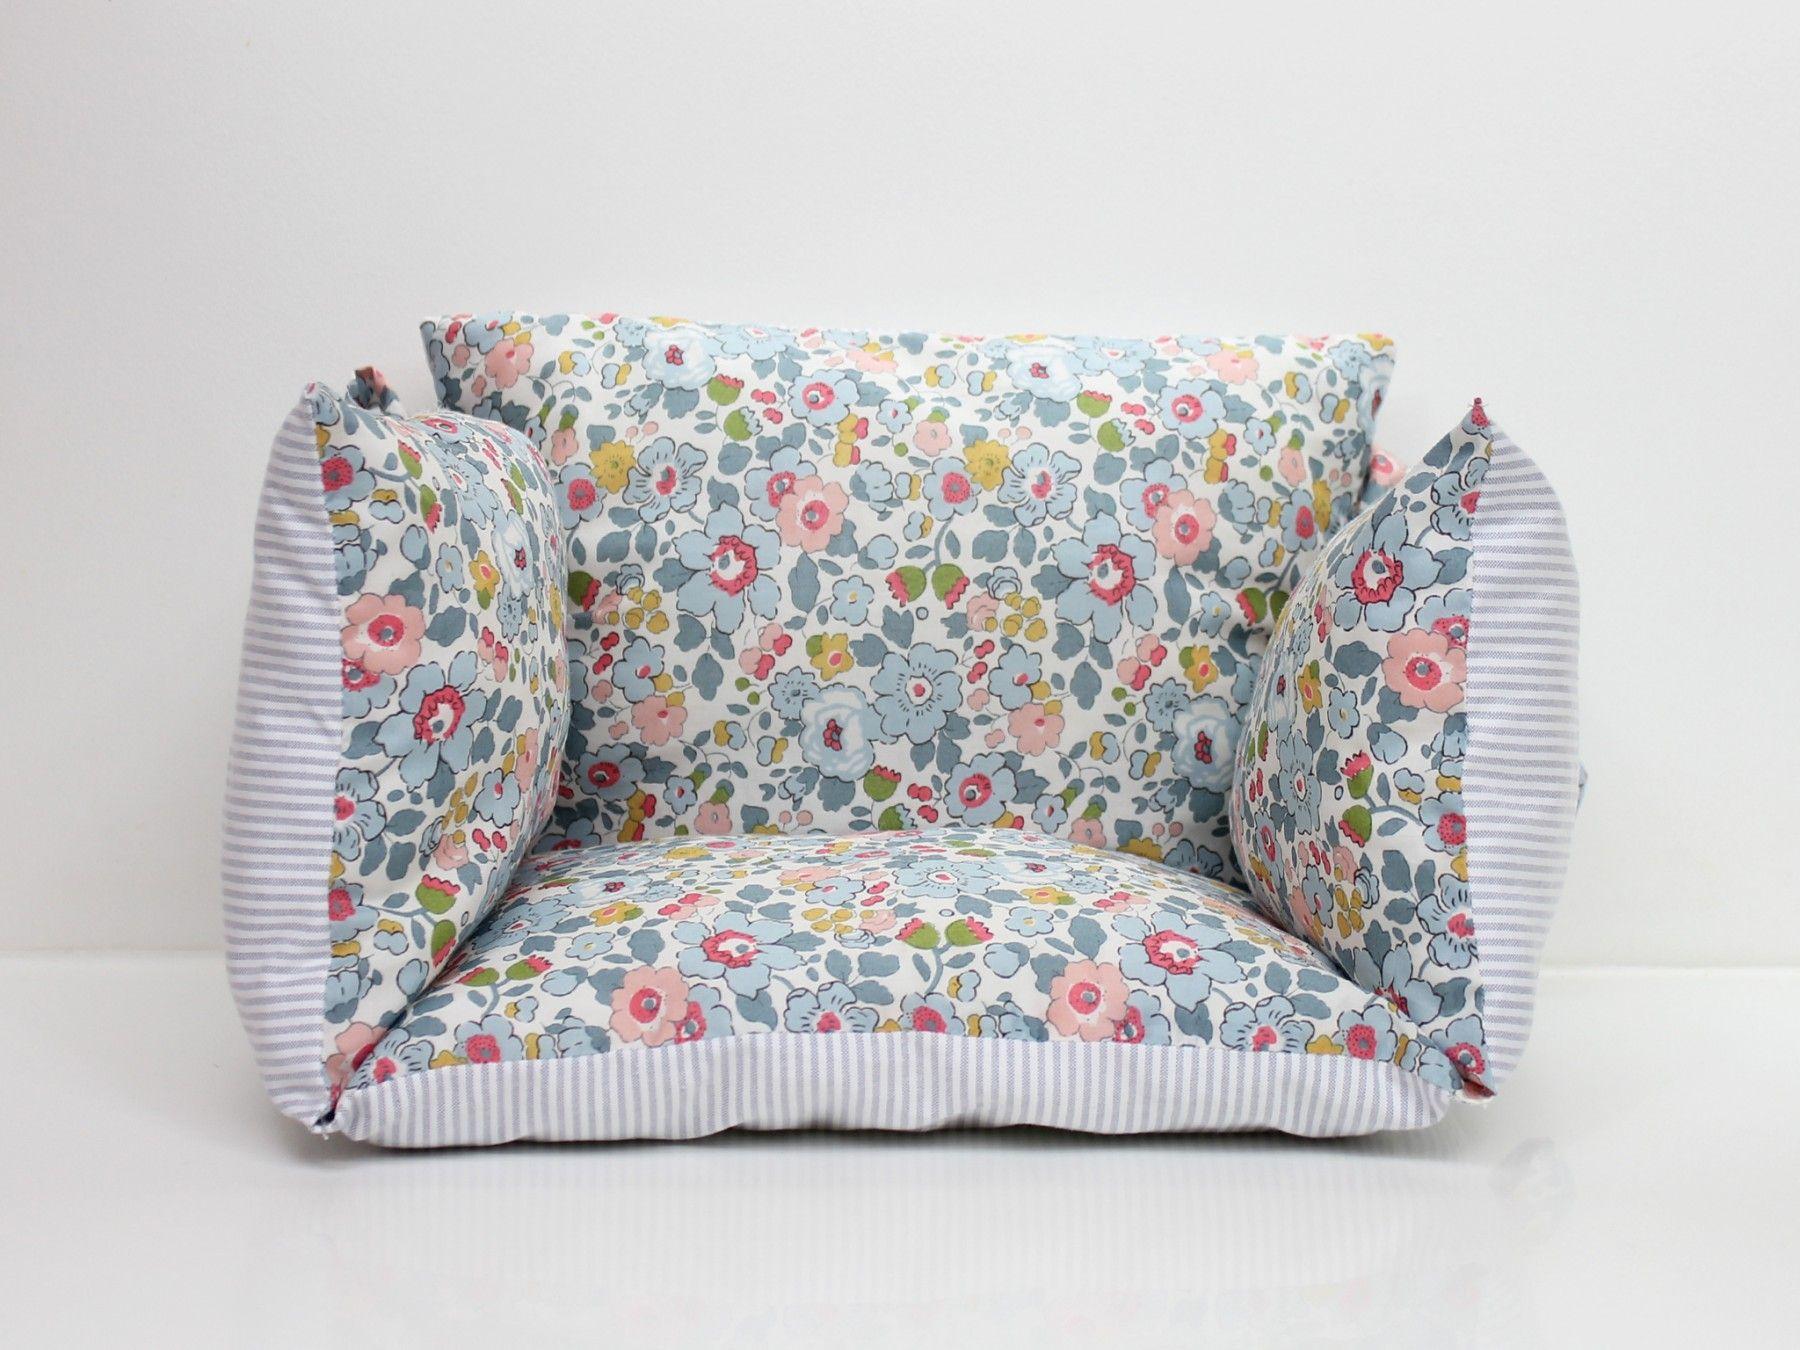 Cushion For High Chair By Lab Silla Para Bebe Tronas Para Bebes Almohadones Para Sillas